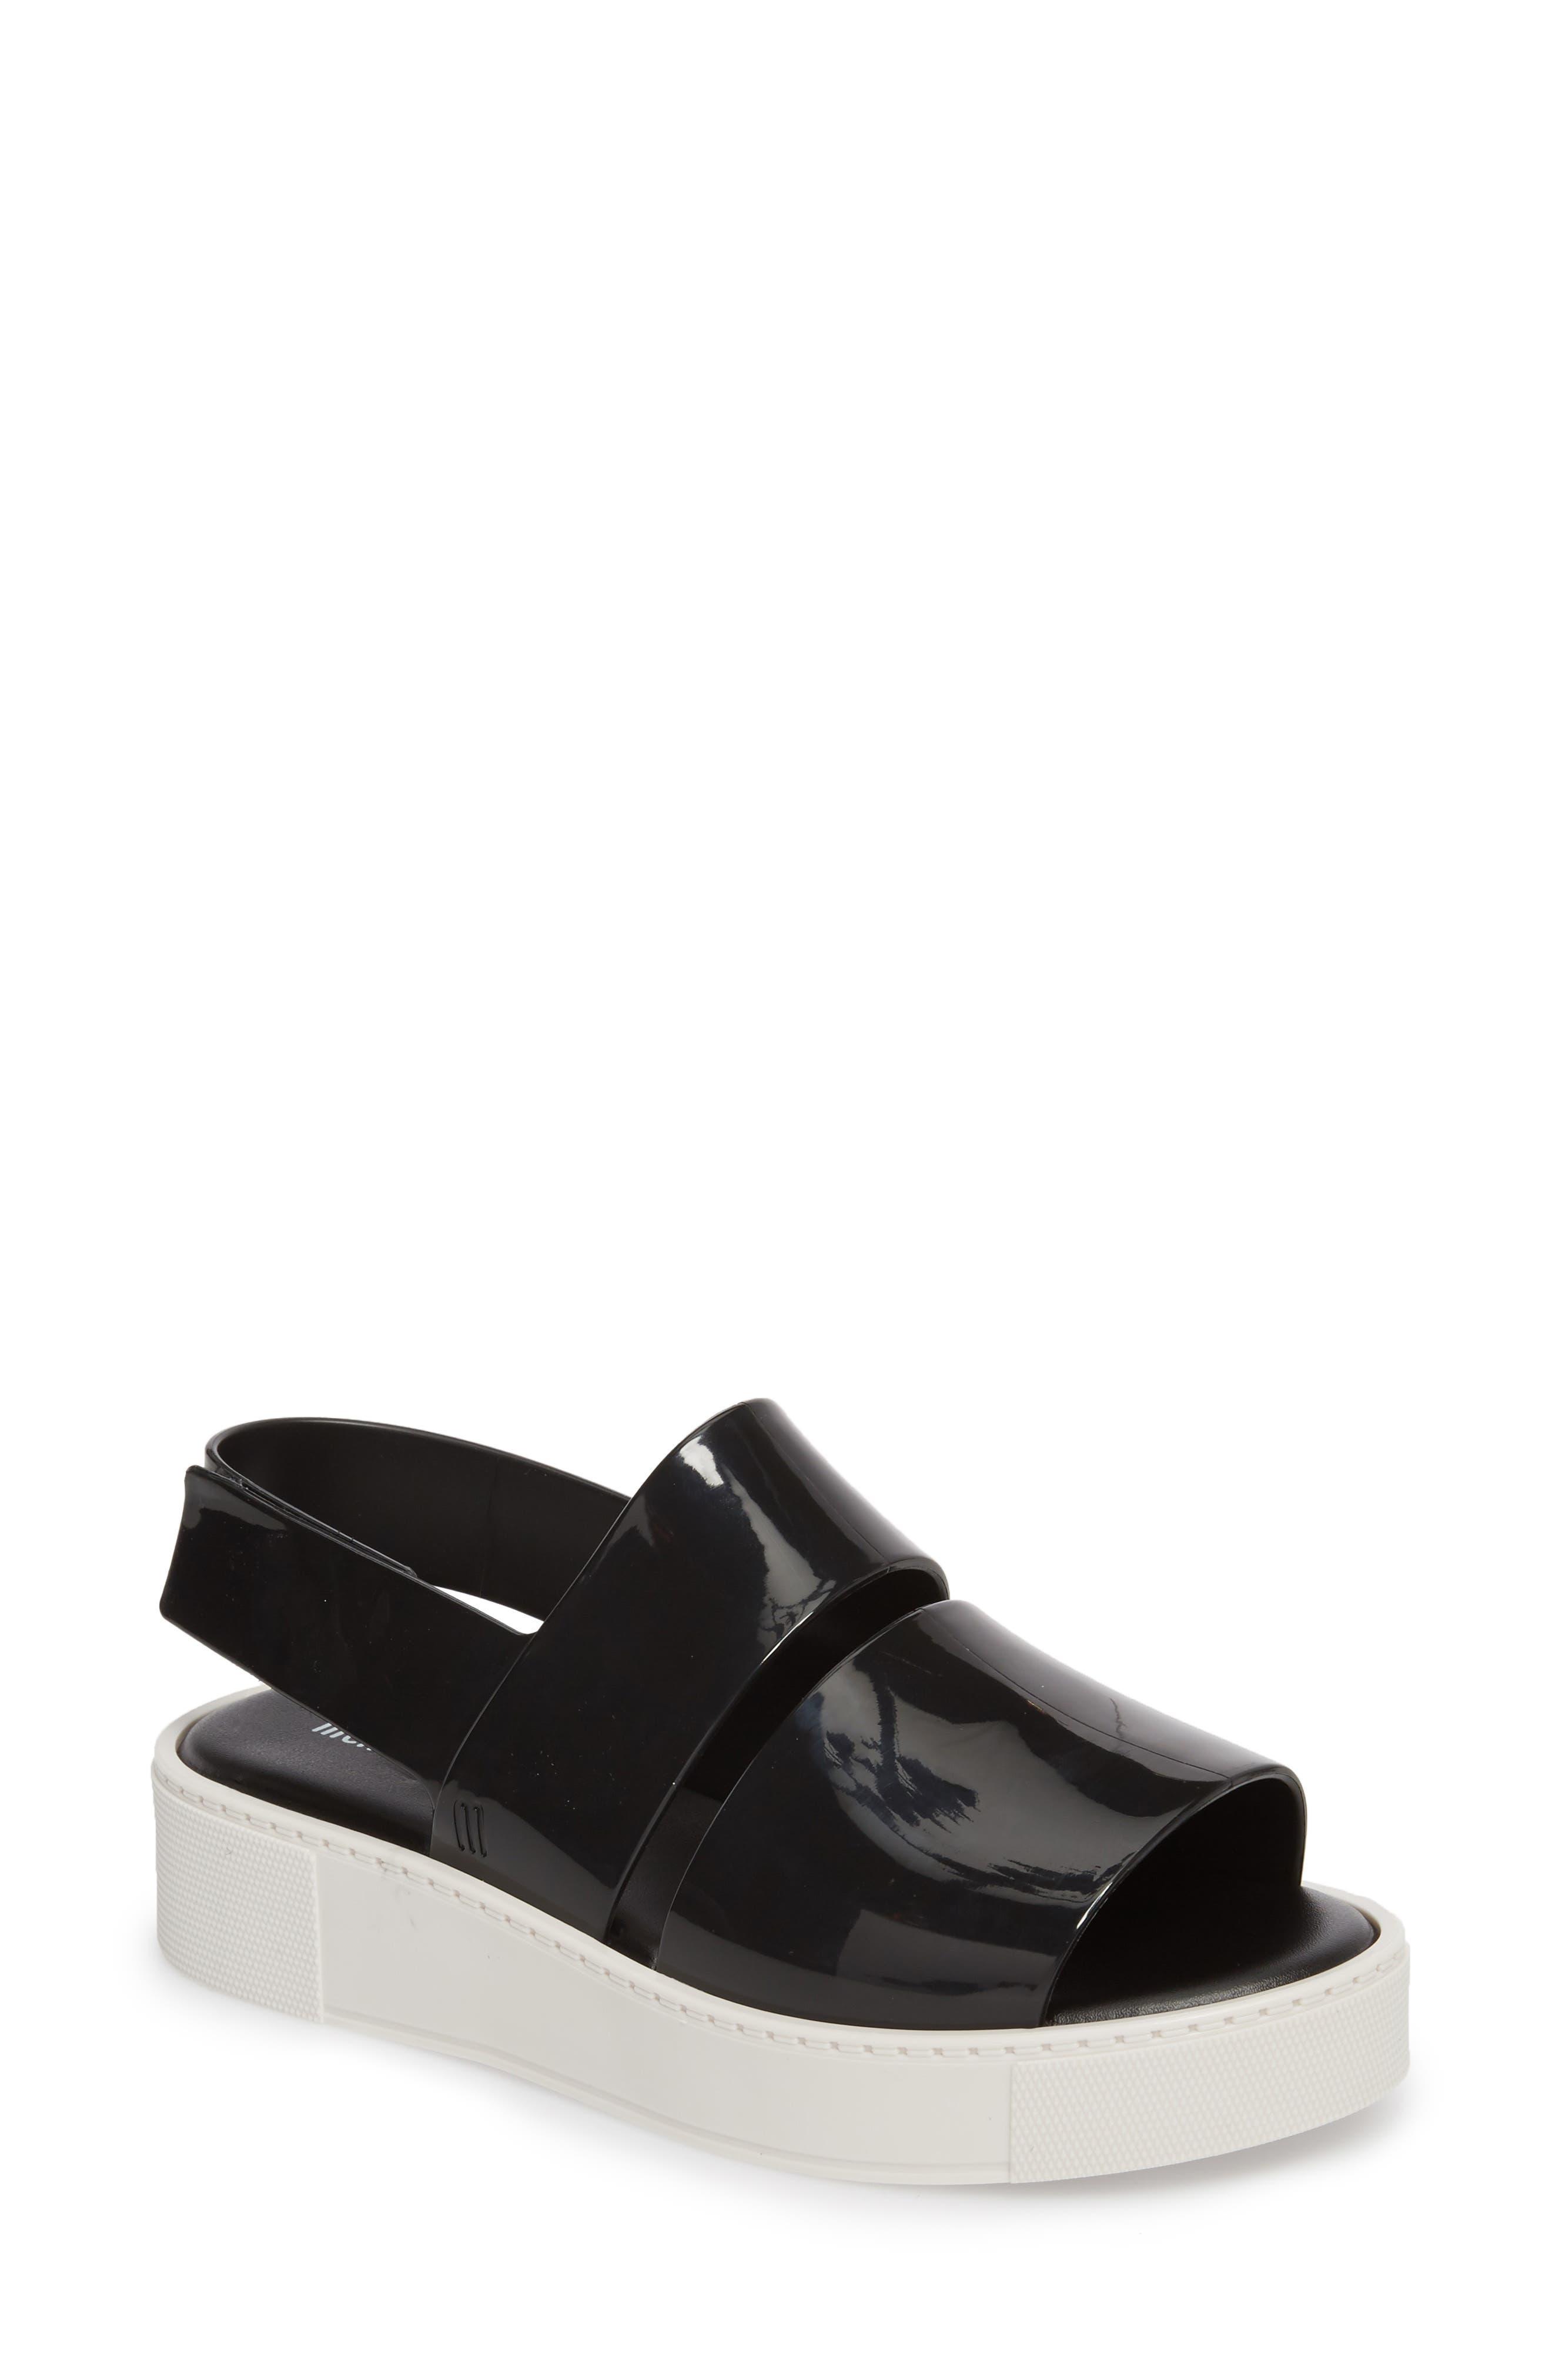 Main Image - Melissa Soho Platform Sandal (Women)